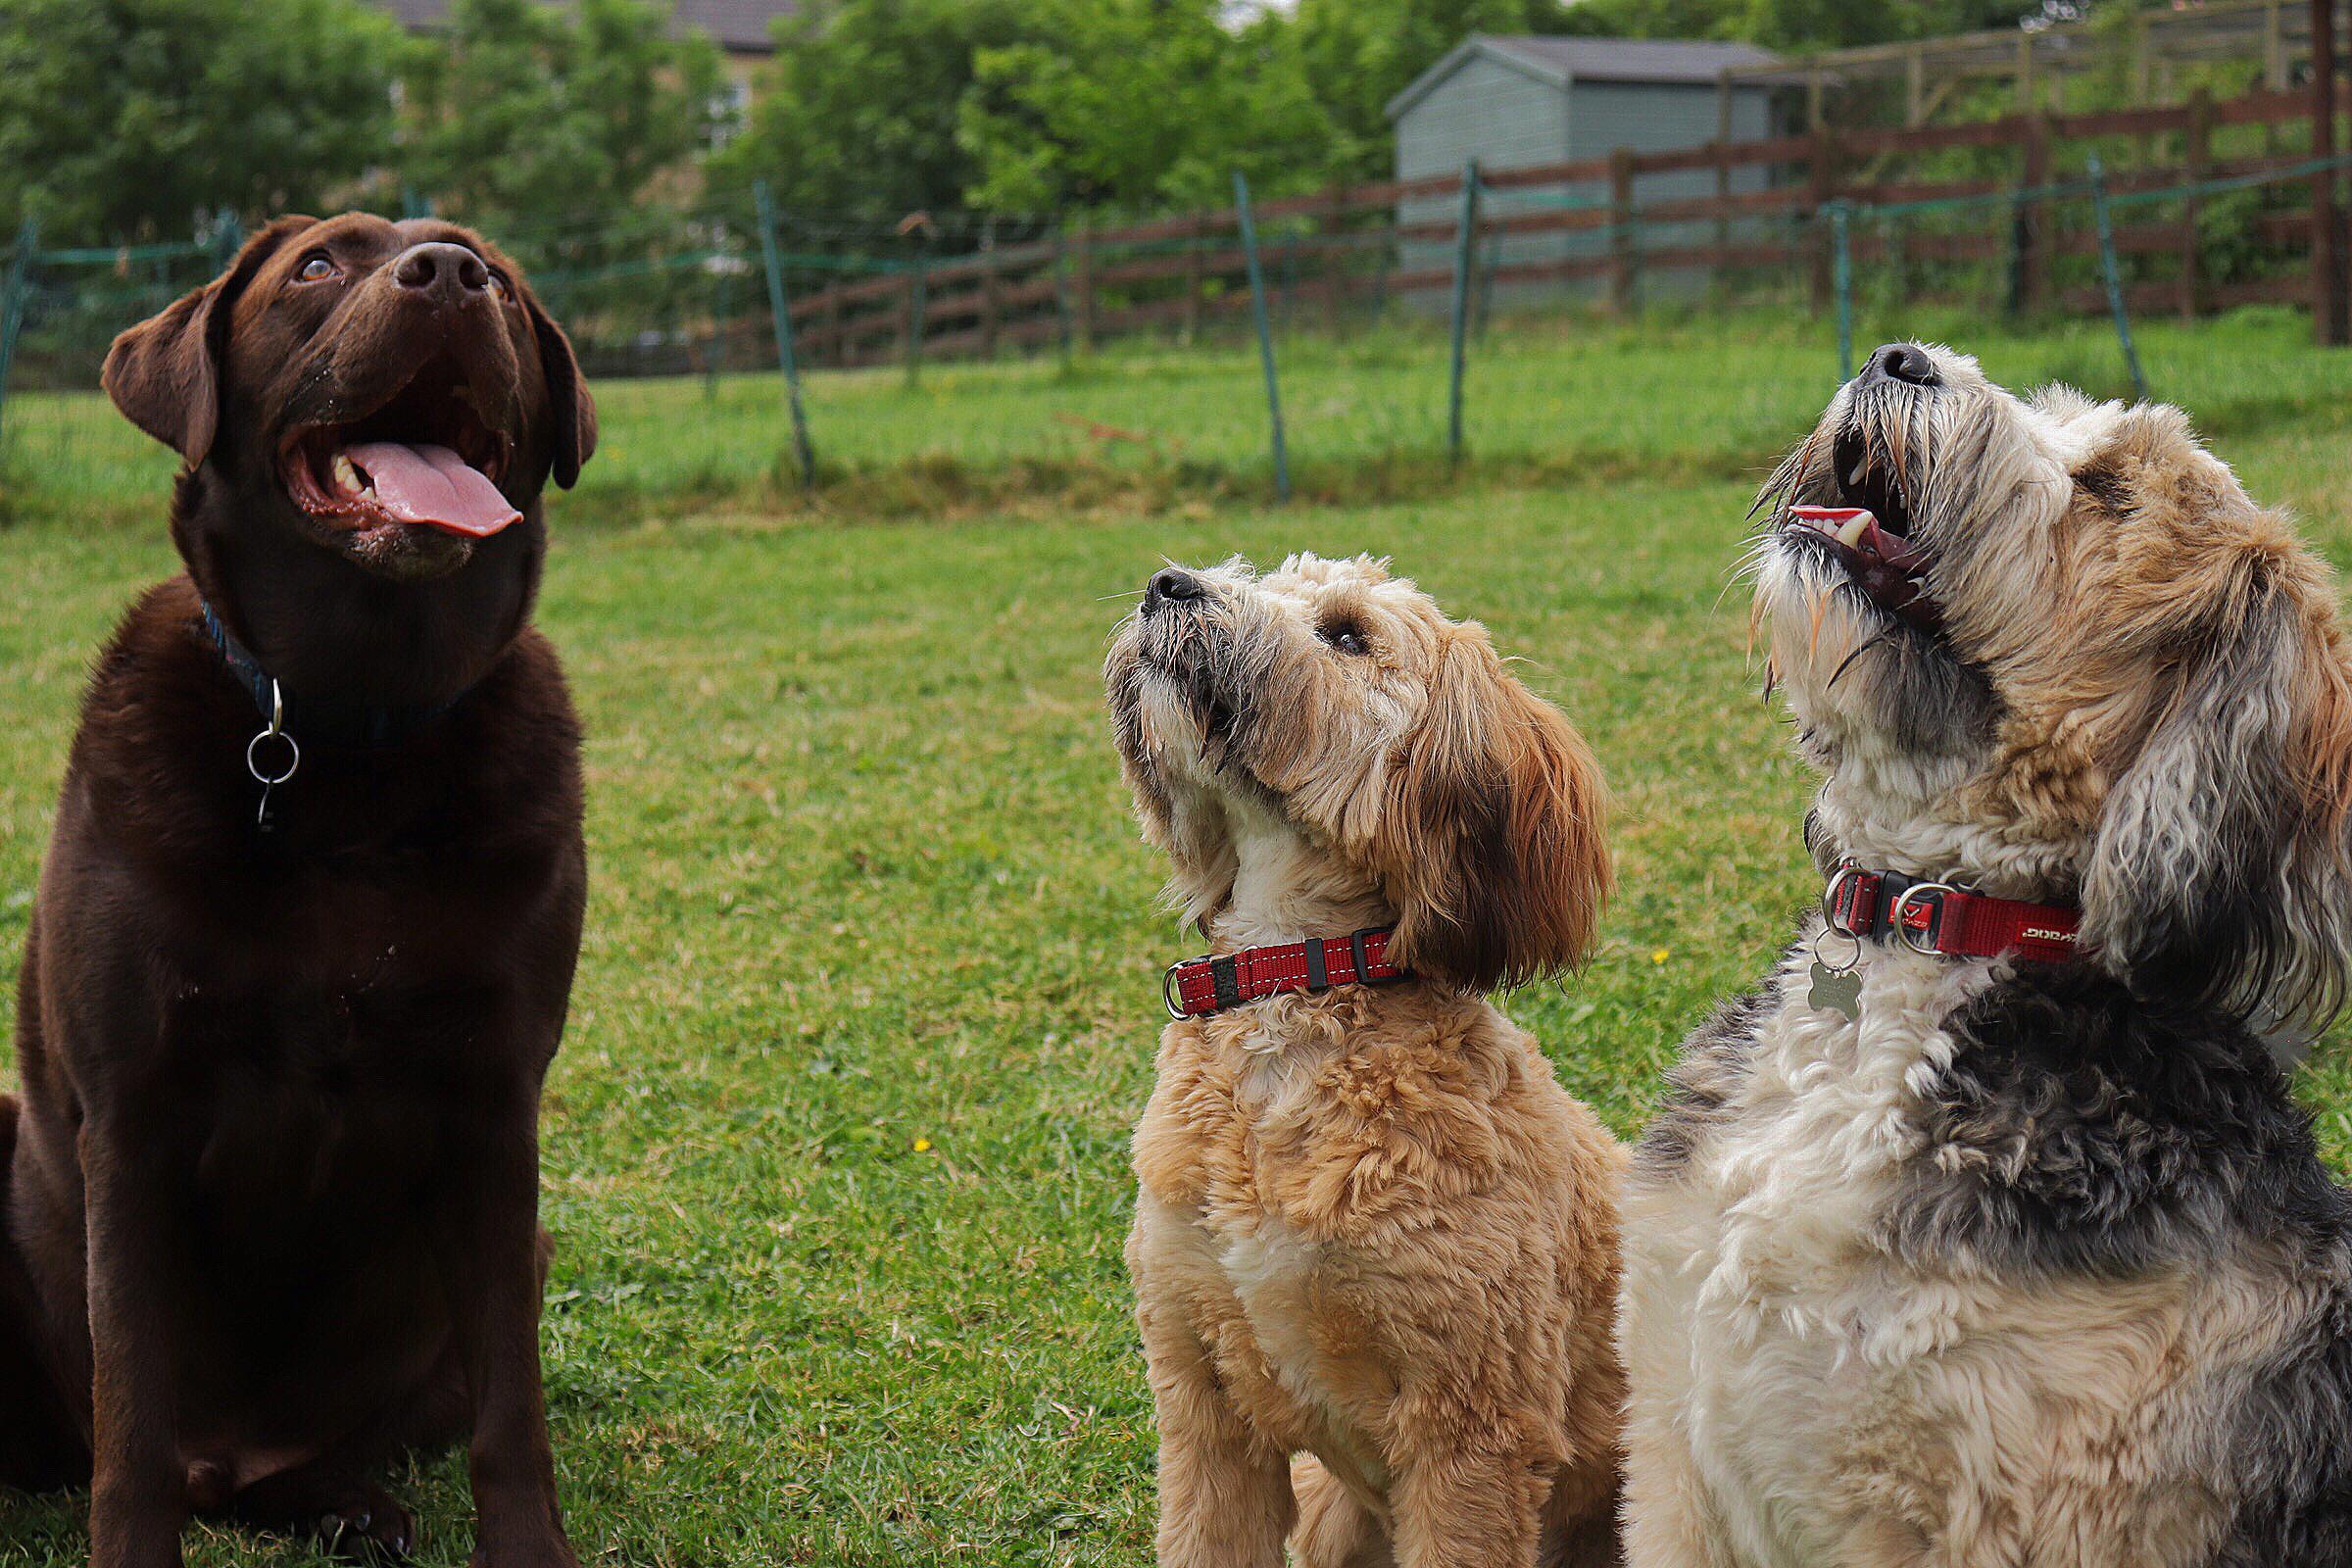 Monty, Jim and Rita